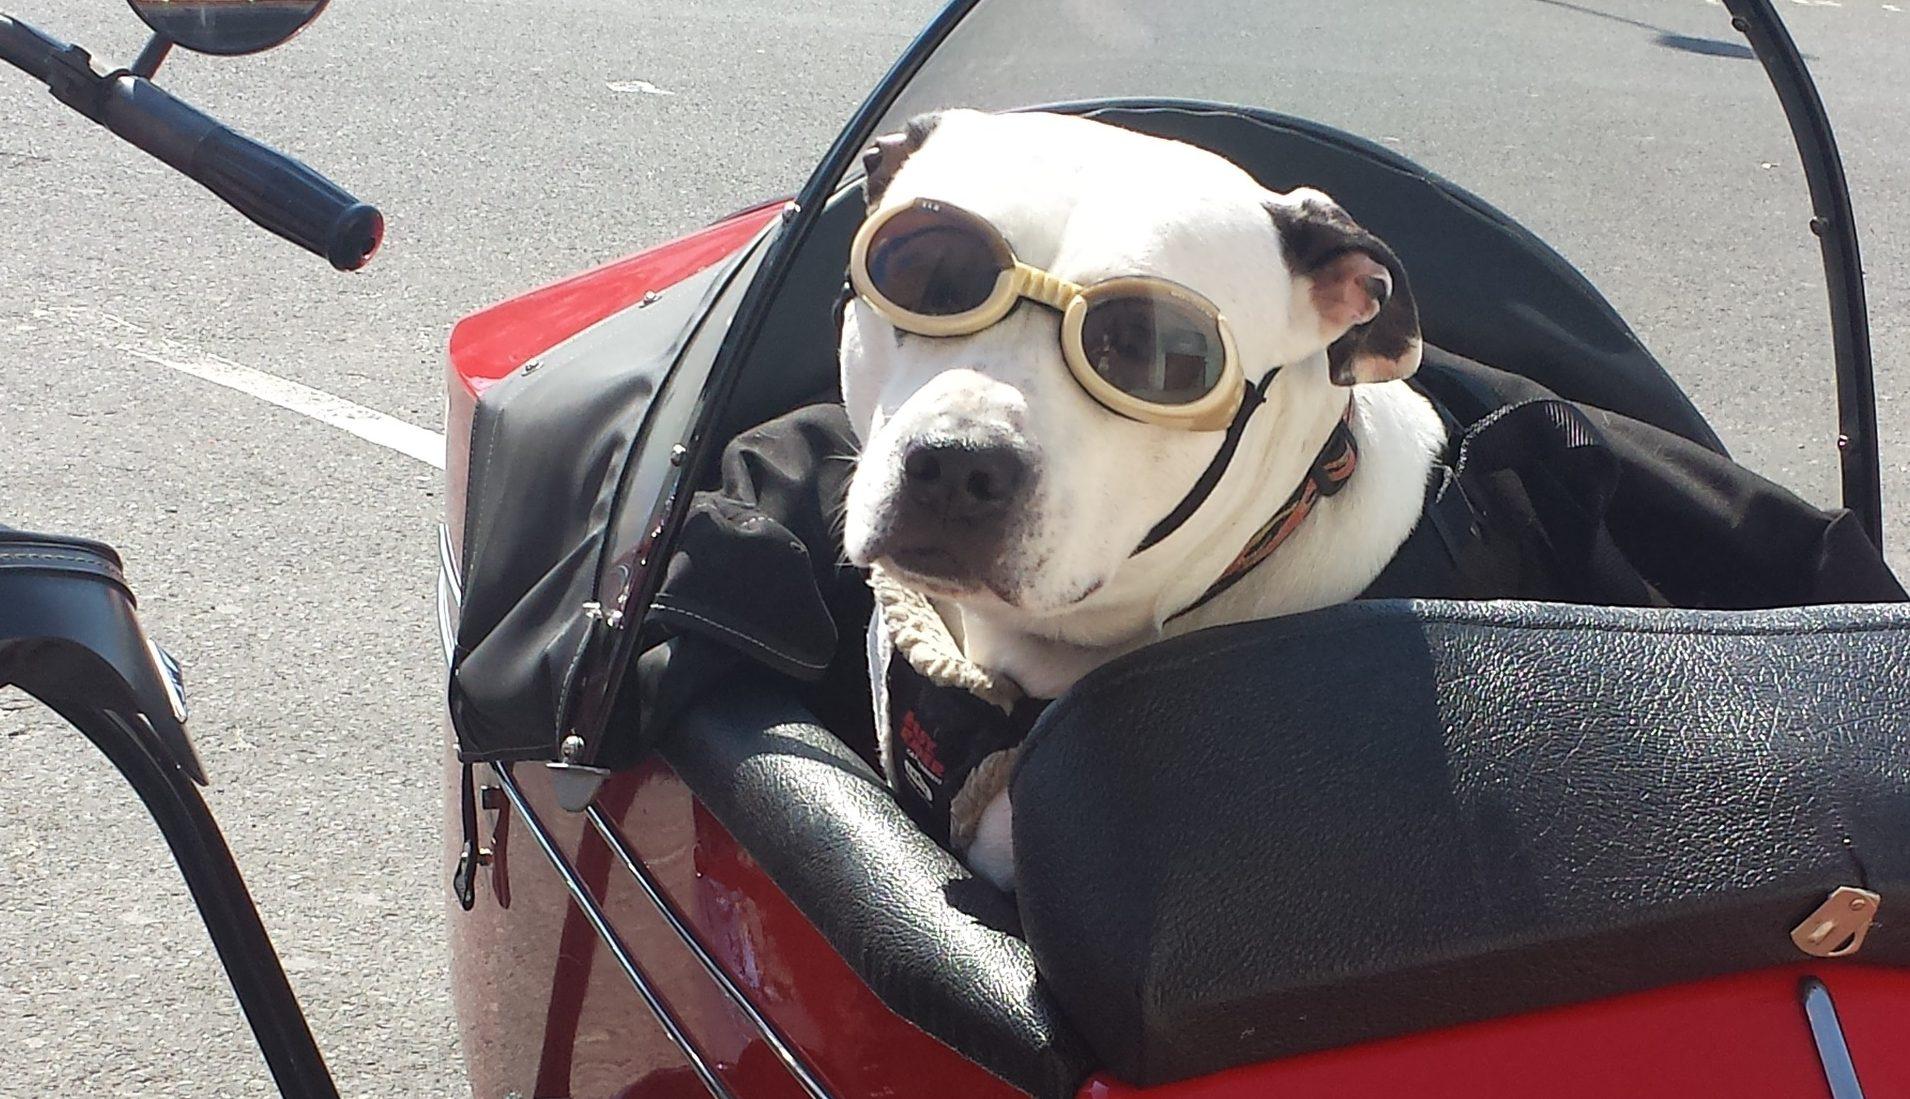 dog carrier motorcycle tank bag - 58% OFF - newriversidehotel.com